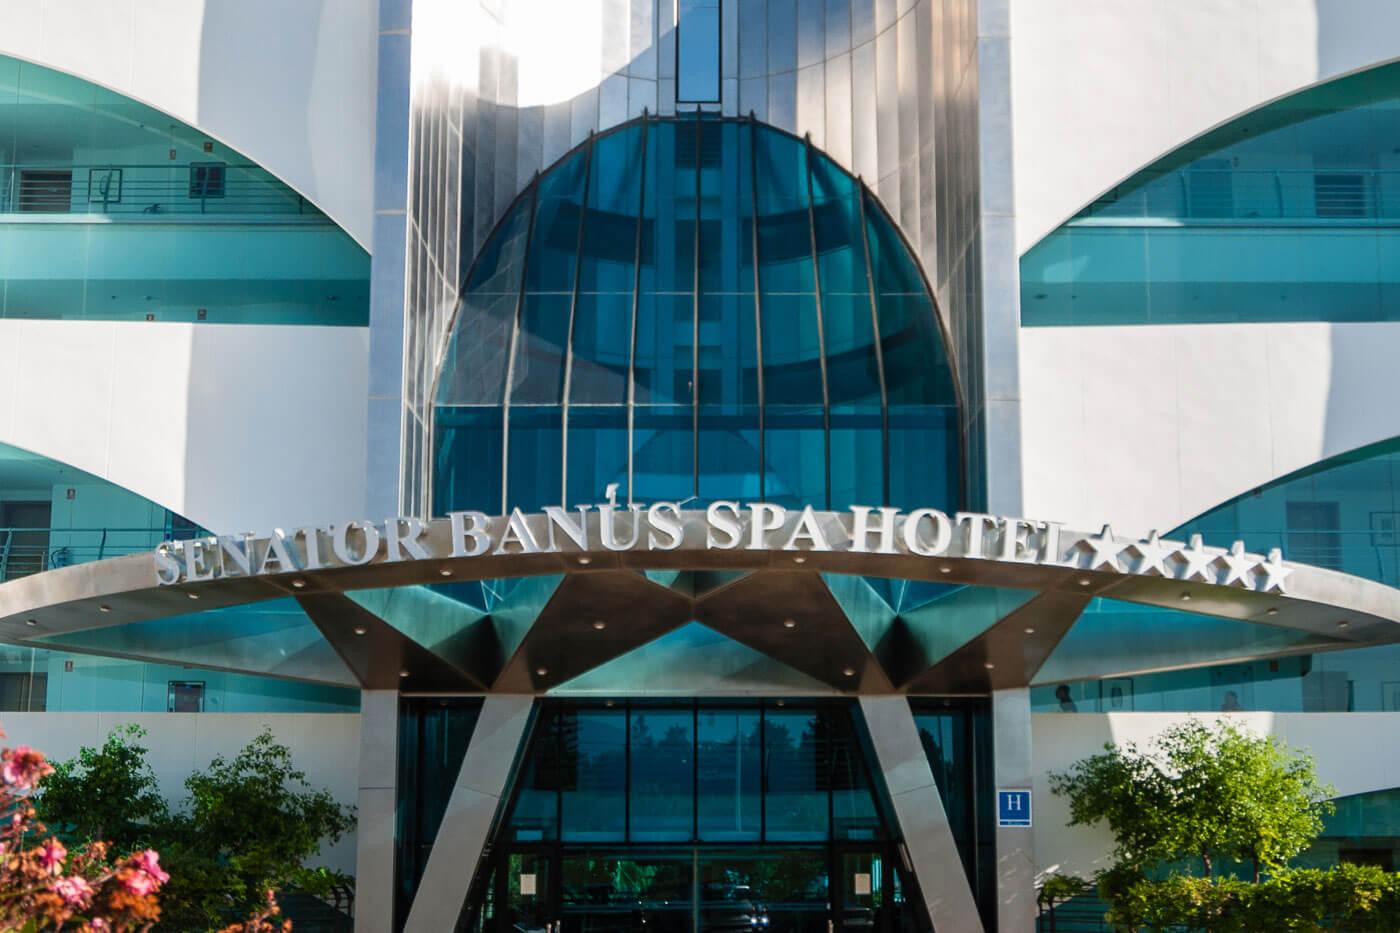 Senator Banus Spa Hotel, Puerta Banus